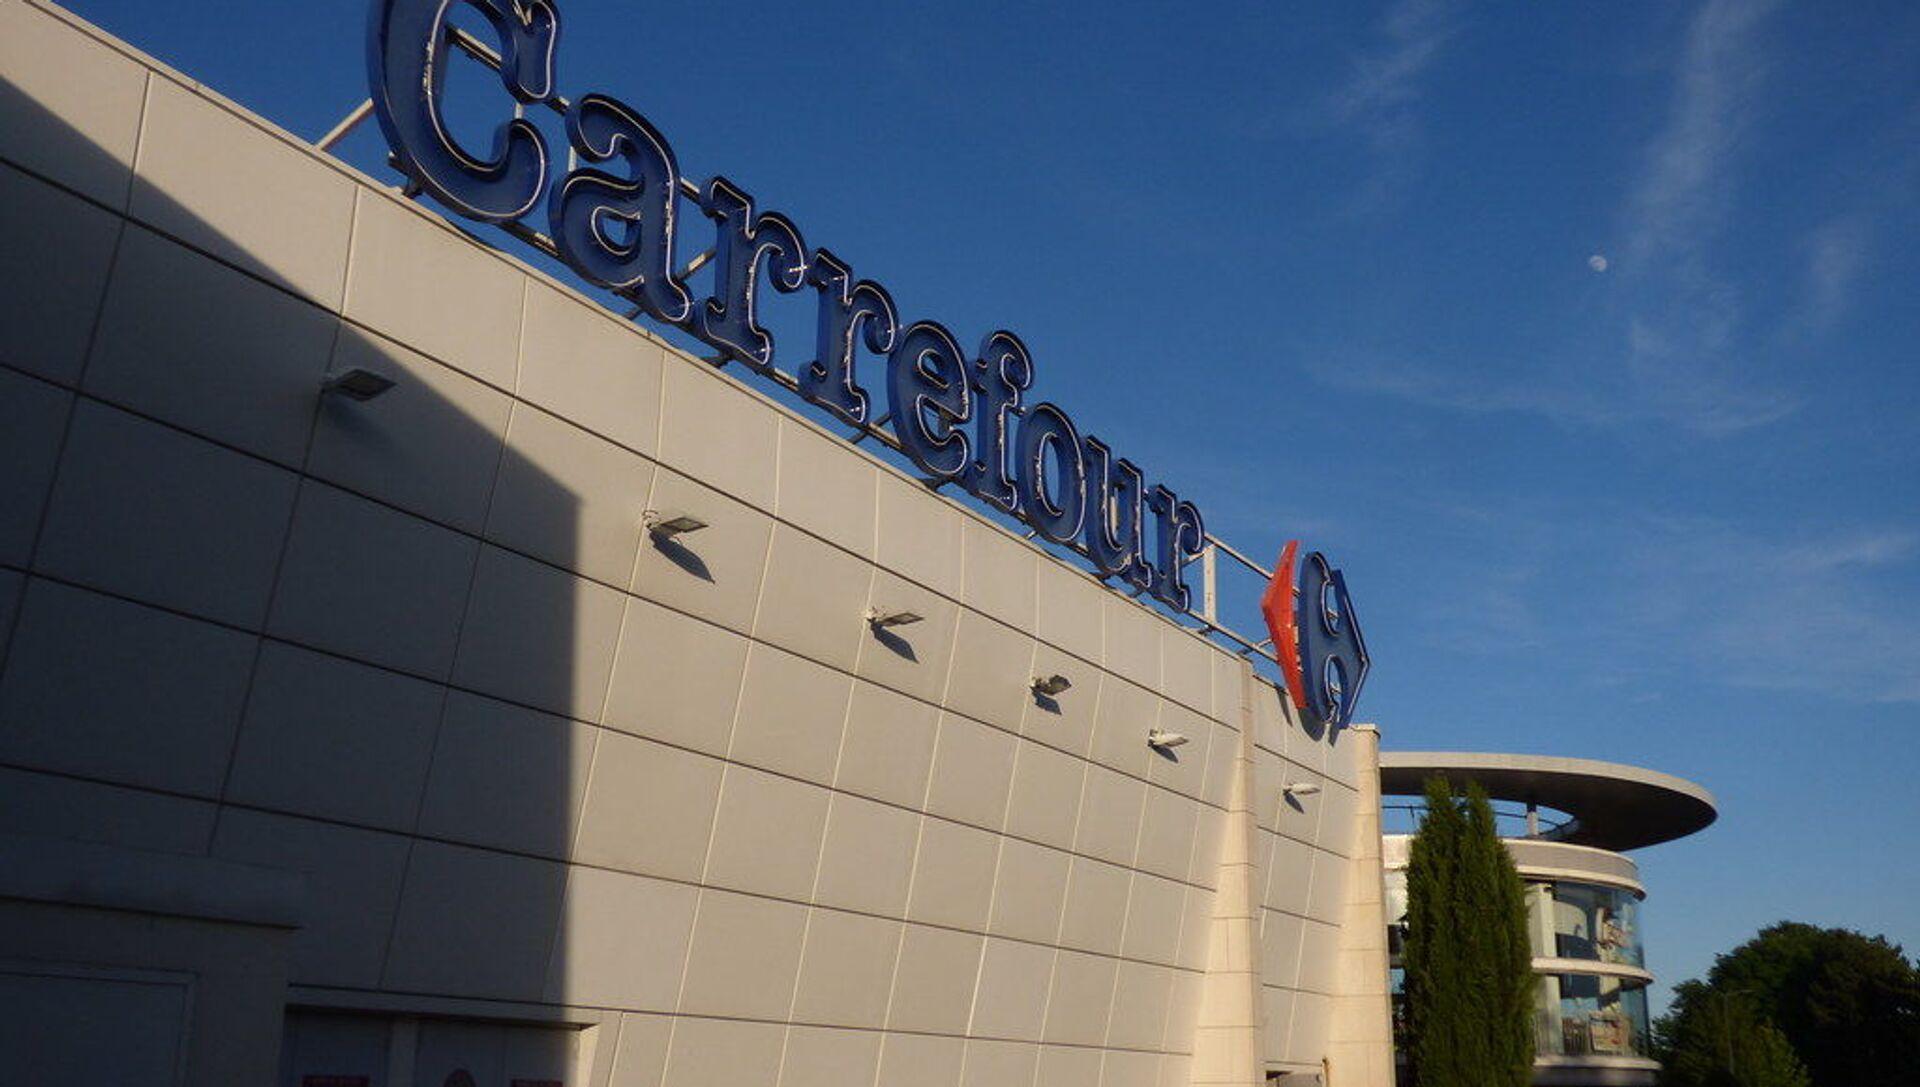 Supermercato Carrefour - Sputnik Italia, 1920, 01.05.2021